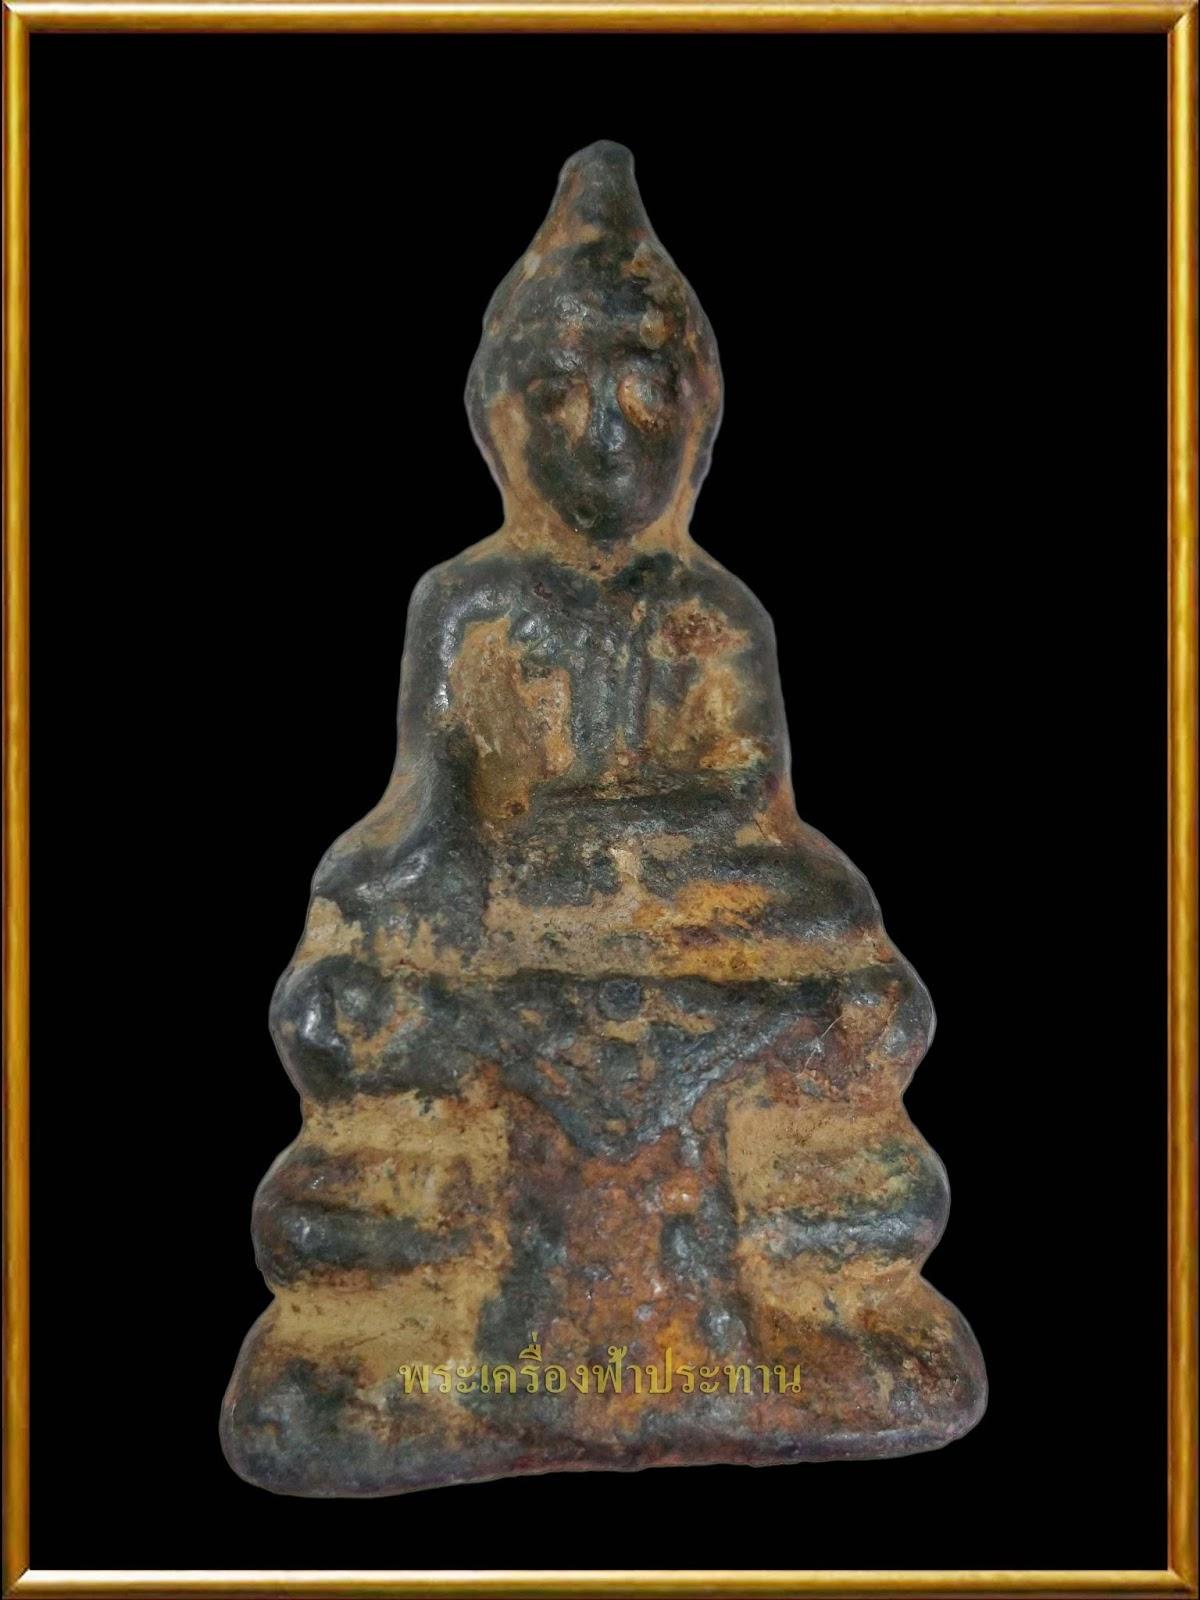 http://tubtimthong-amulet.blogspot.com/2012/11/blog-post_5744.html